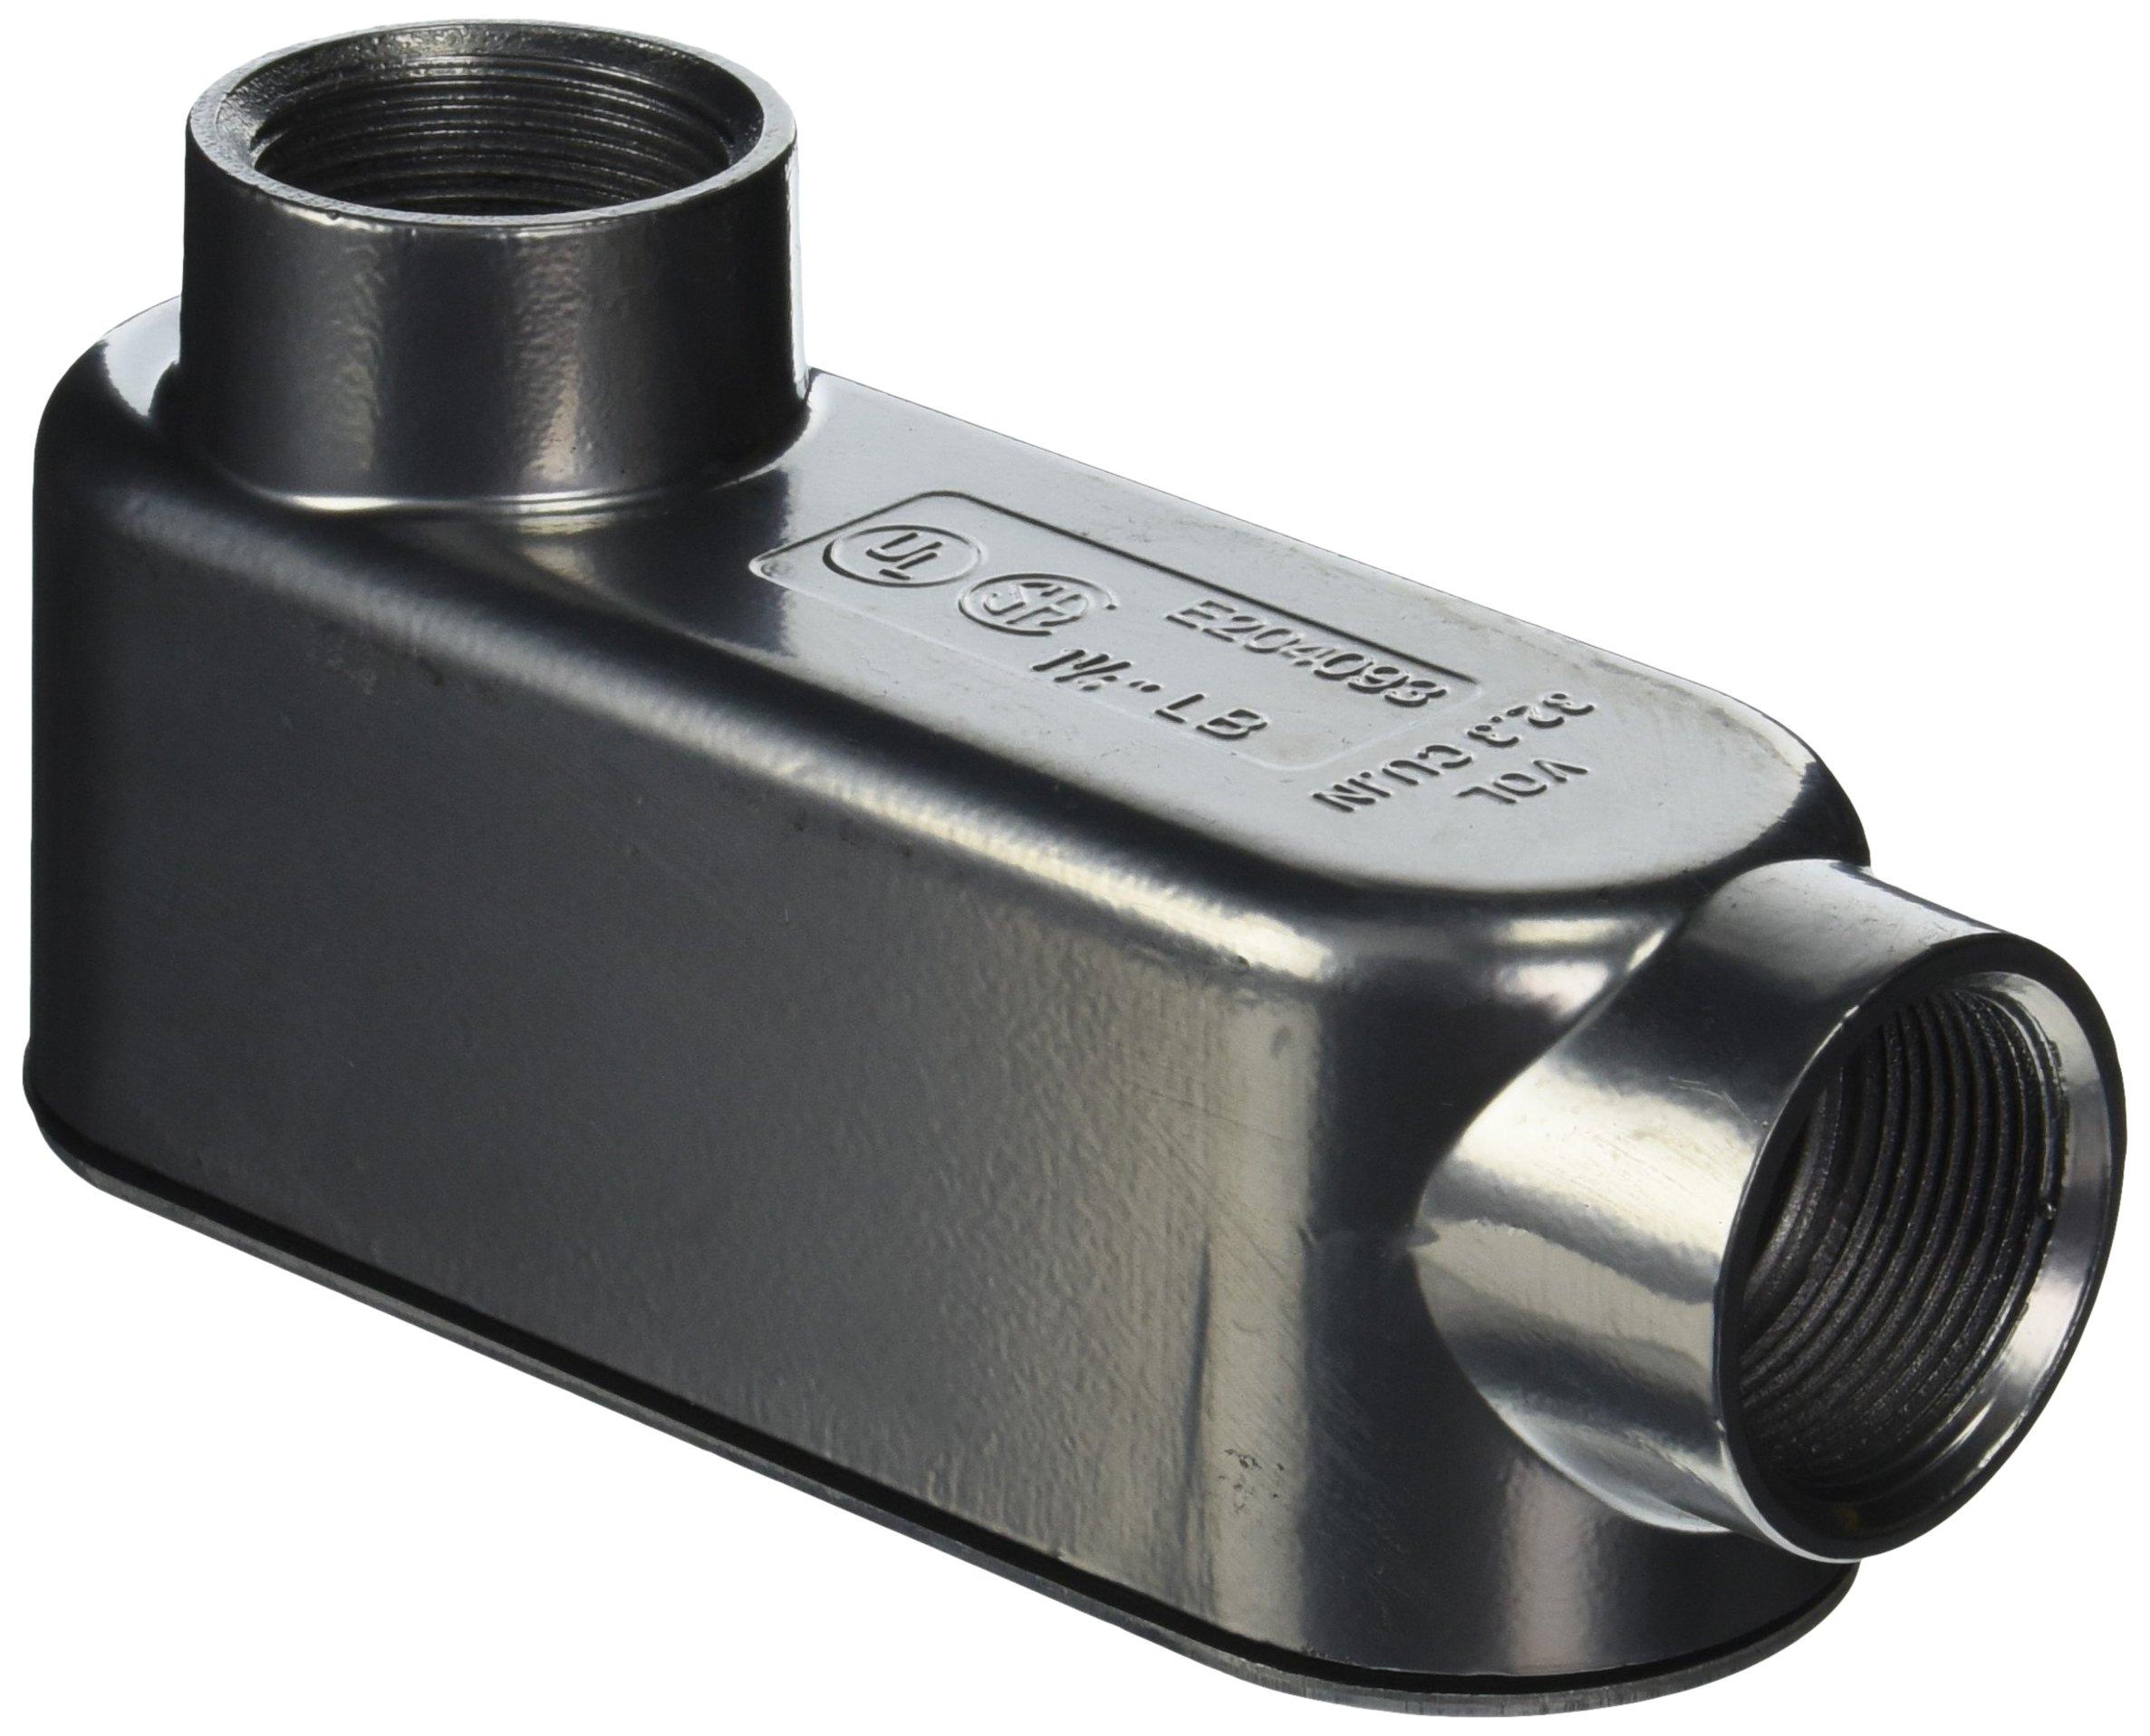 Halex 58612 1-1/4-Inch RGD Threaded Conduit Bodies Type LB